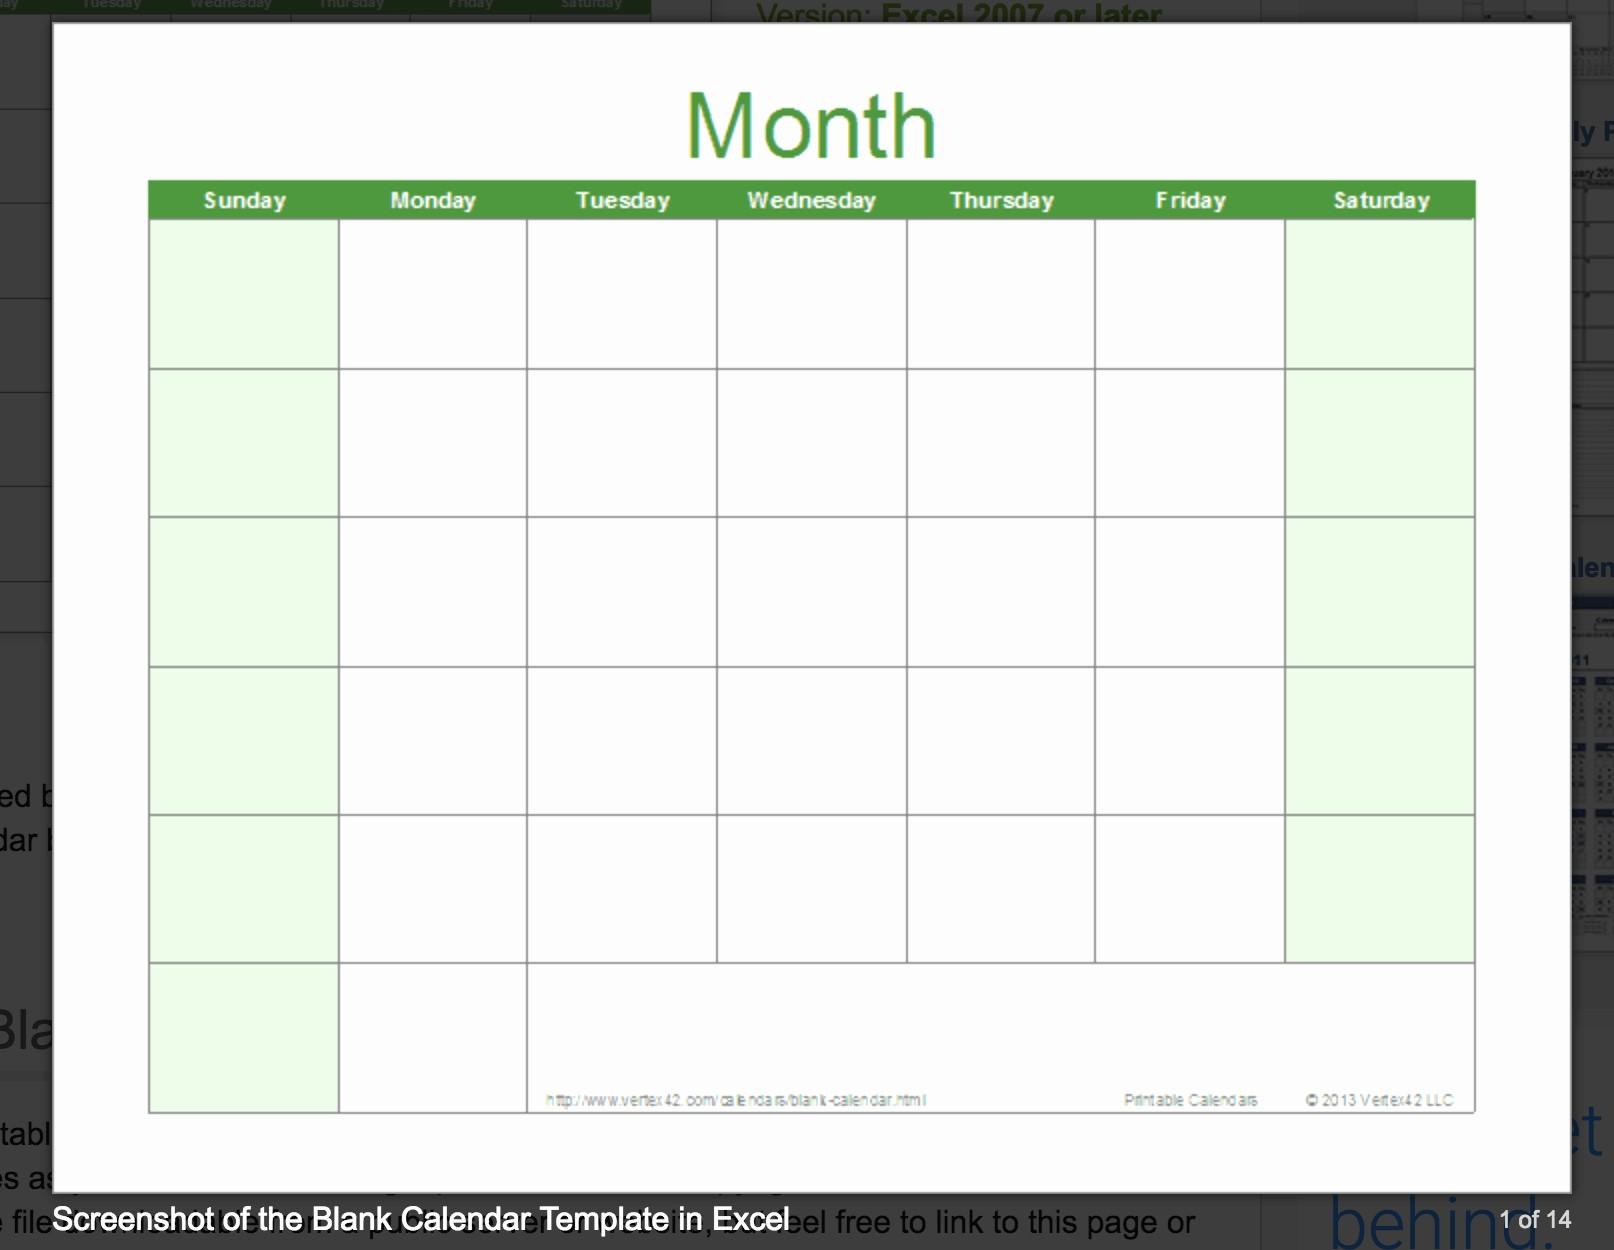 excel calendar templates free 2019 excel calendar templates free 2019 blank calendar wonderfully printable 2019 templates